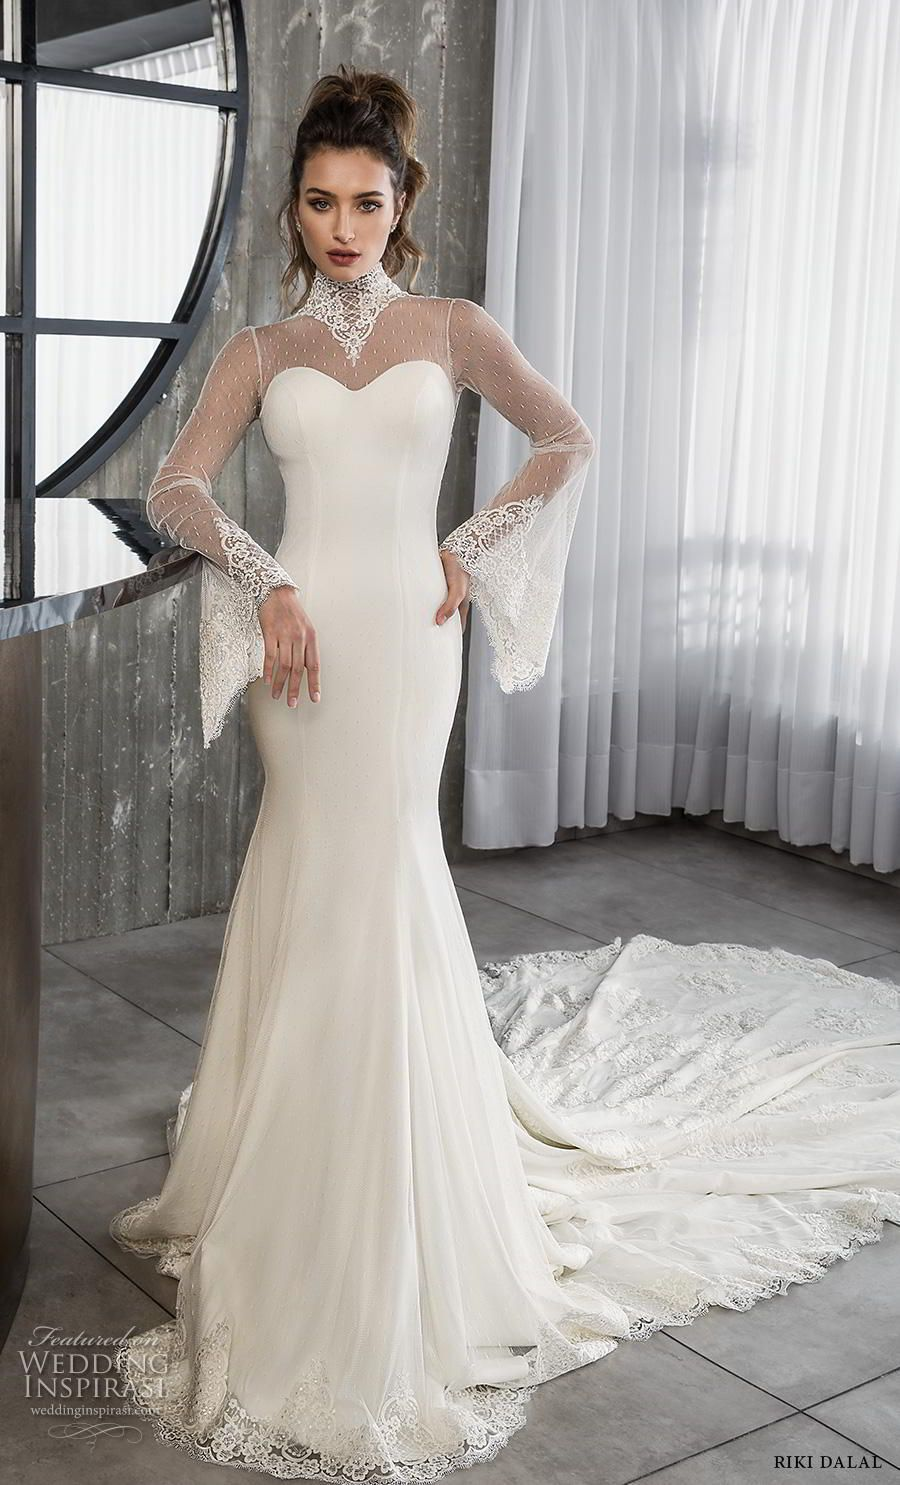 5fc52cb734 riki dalal 2018 glamour bridal long bell sleeves illusion high neck  sweetheart neckline simple elegant fit and flare wedding dress keyhole back  chapel train ...